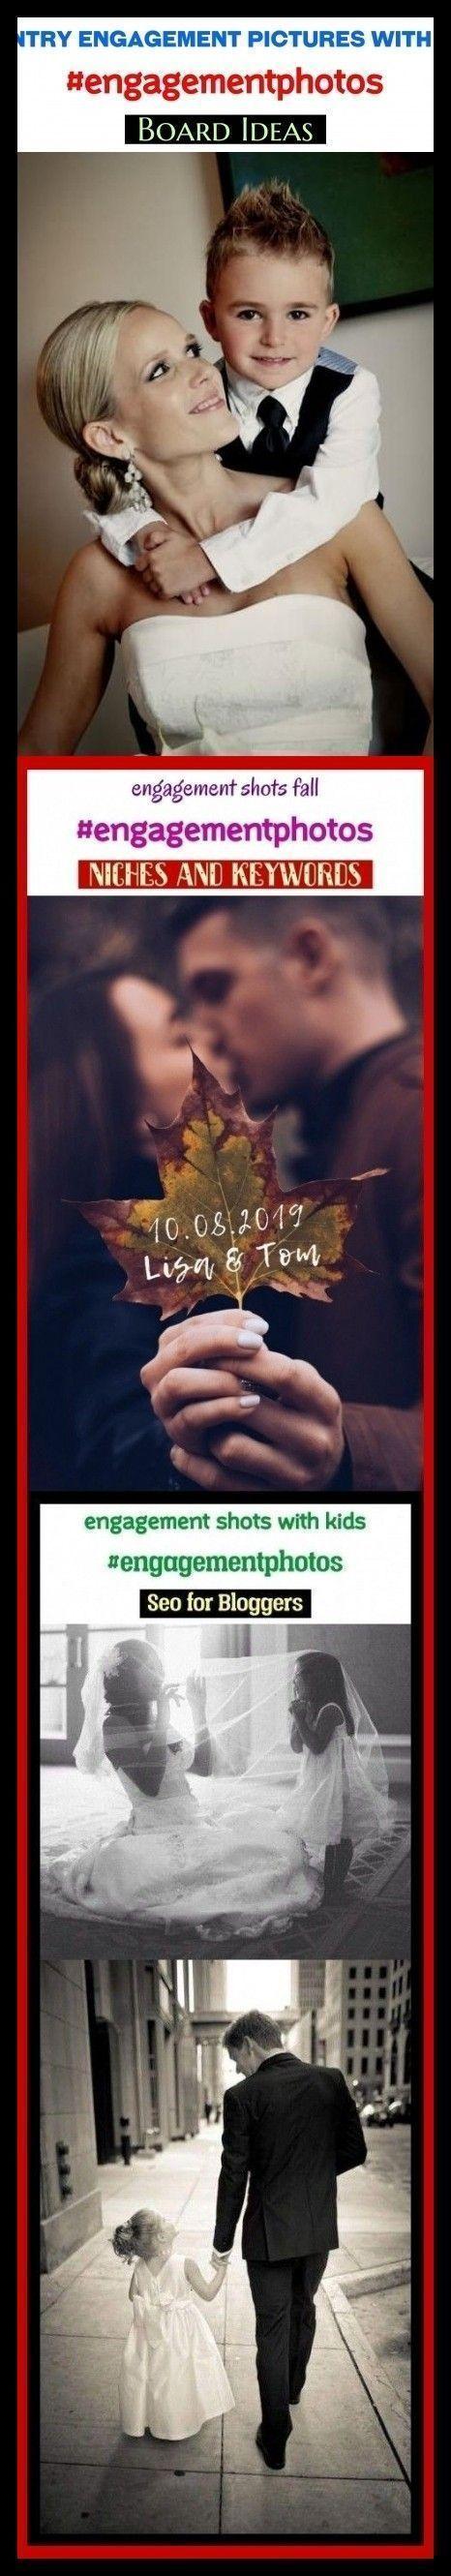 Eheringe # Engagement # Bilder # lustige Herbst Verlobungsbilder lustig, Herbst ...